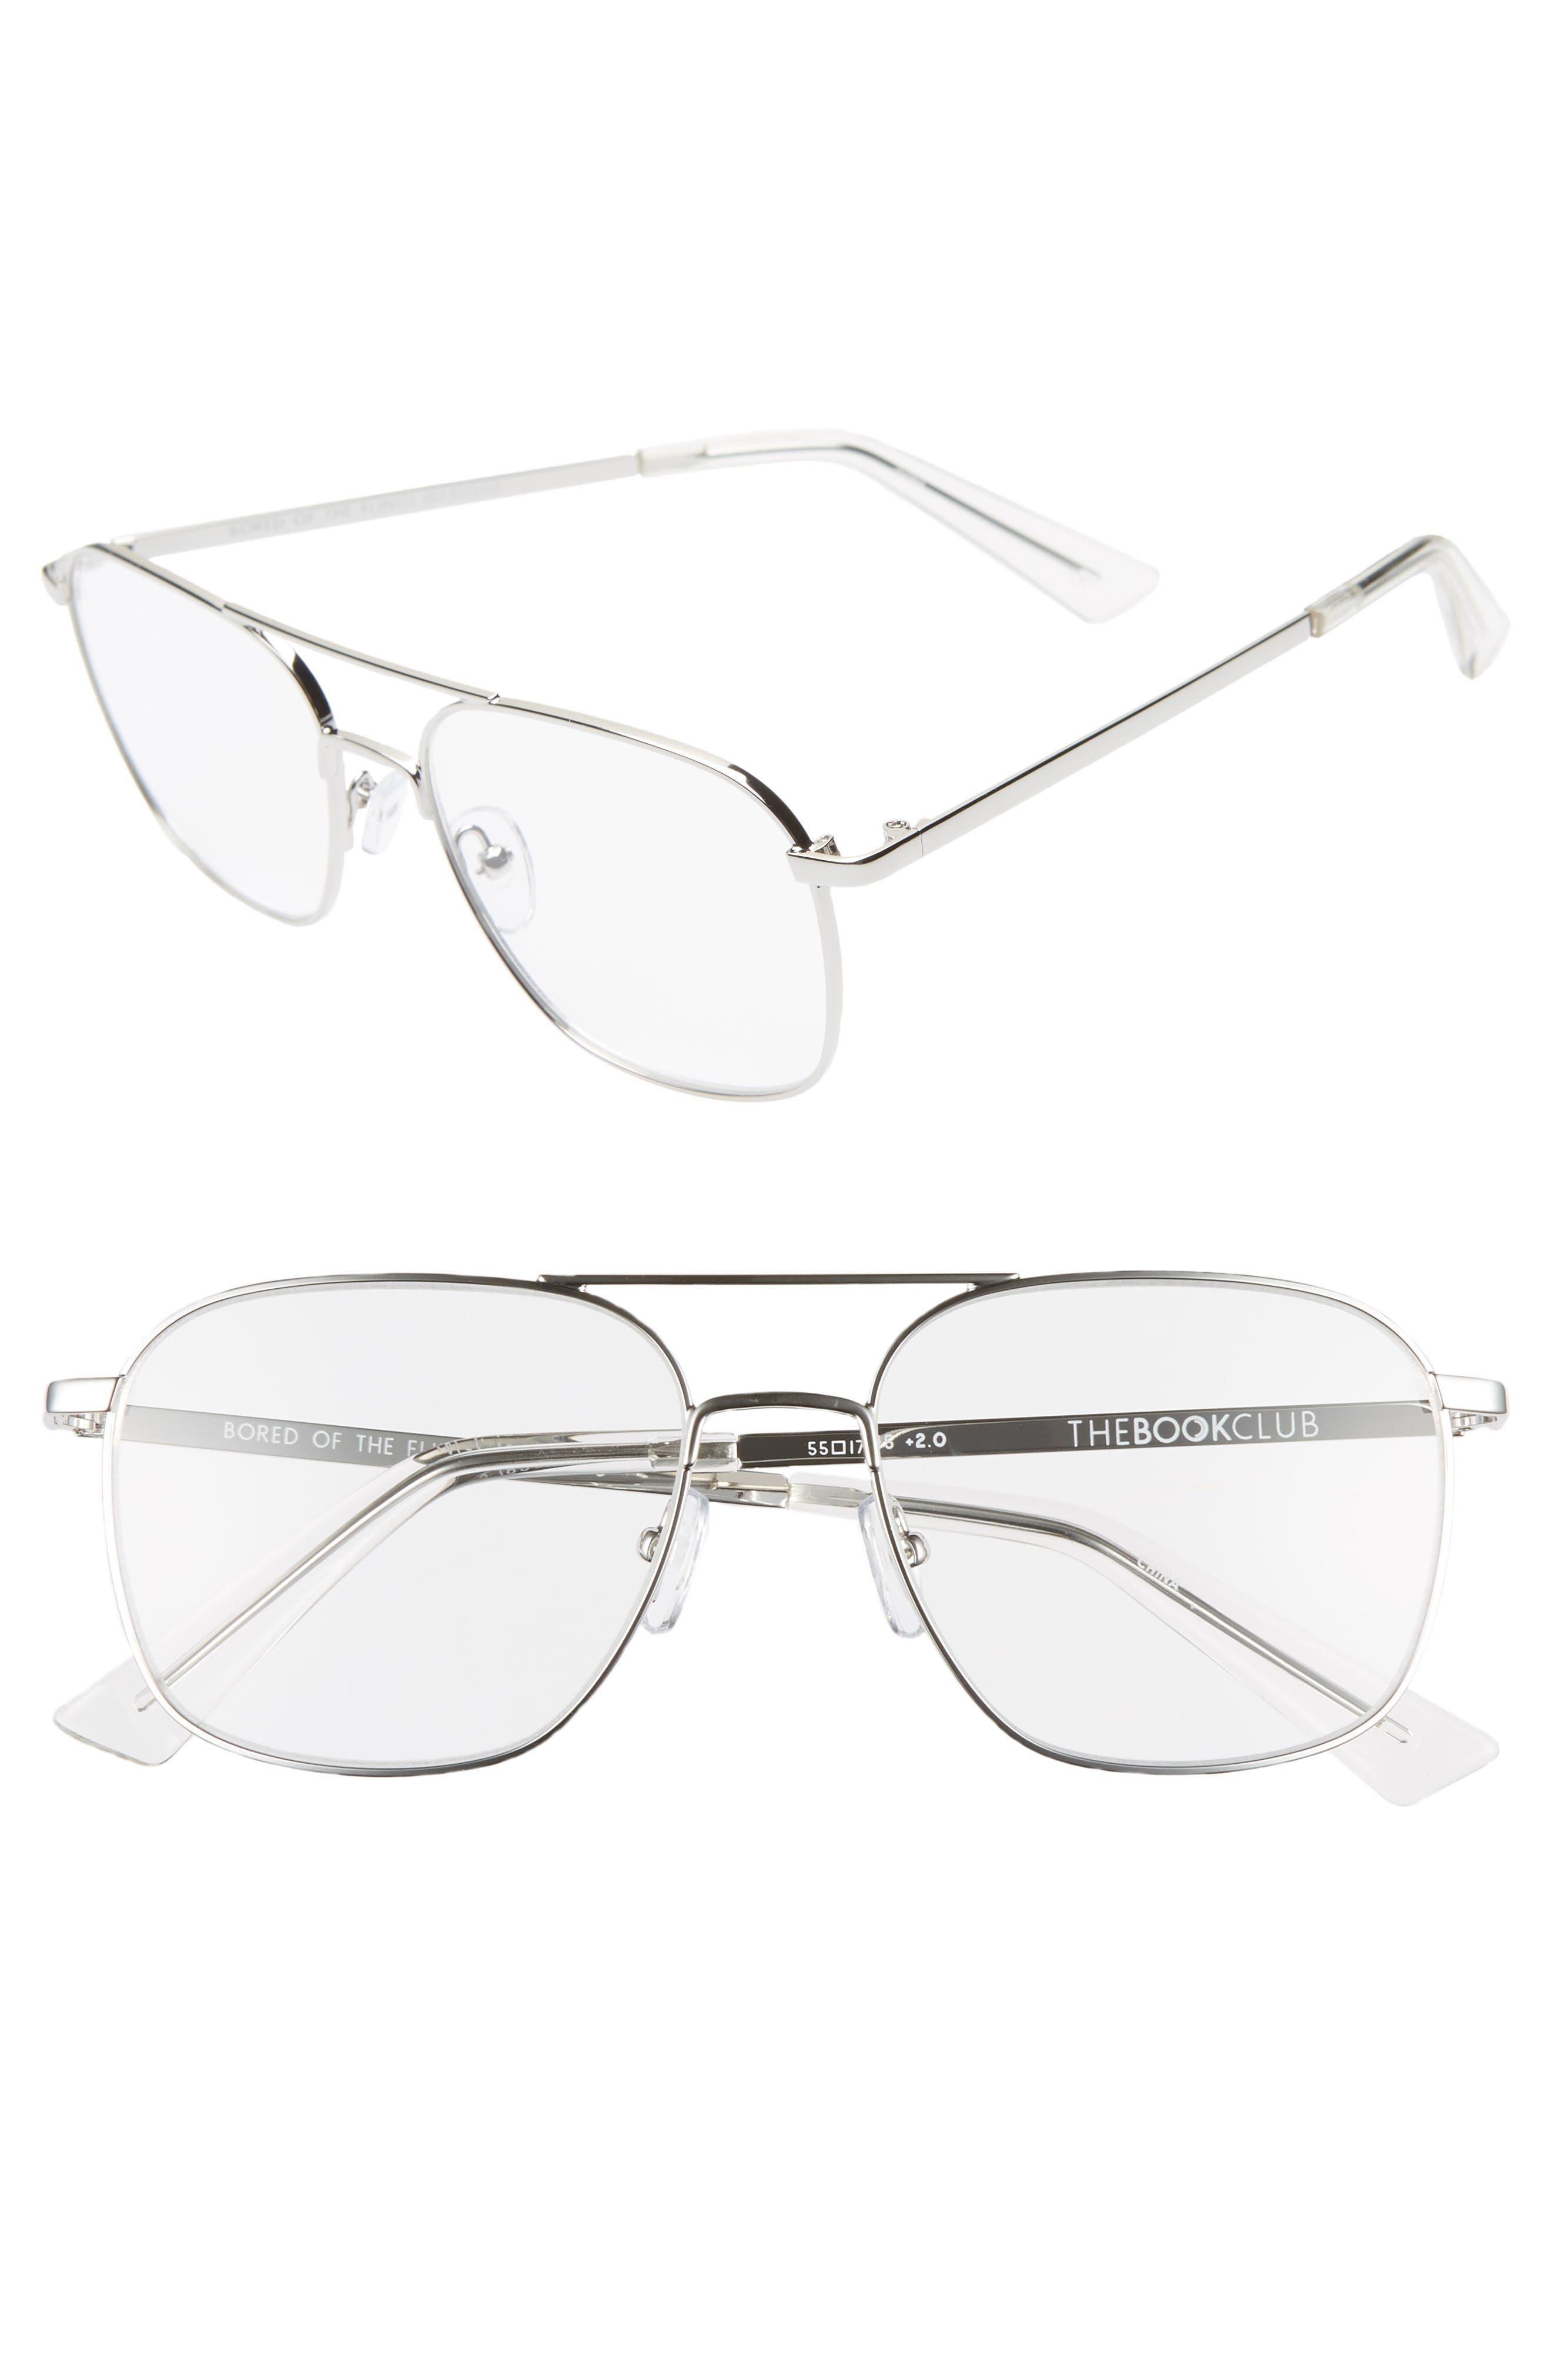 abed73a2a4a7 Buy the bookclub sunglasses & eyewear for women - Best women's the bookclub  sunglasses & eyewear shop - Cools.com